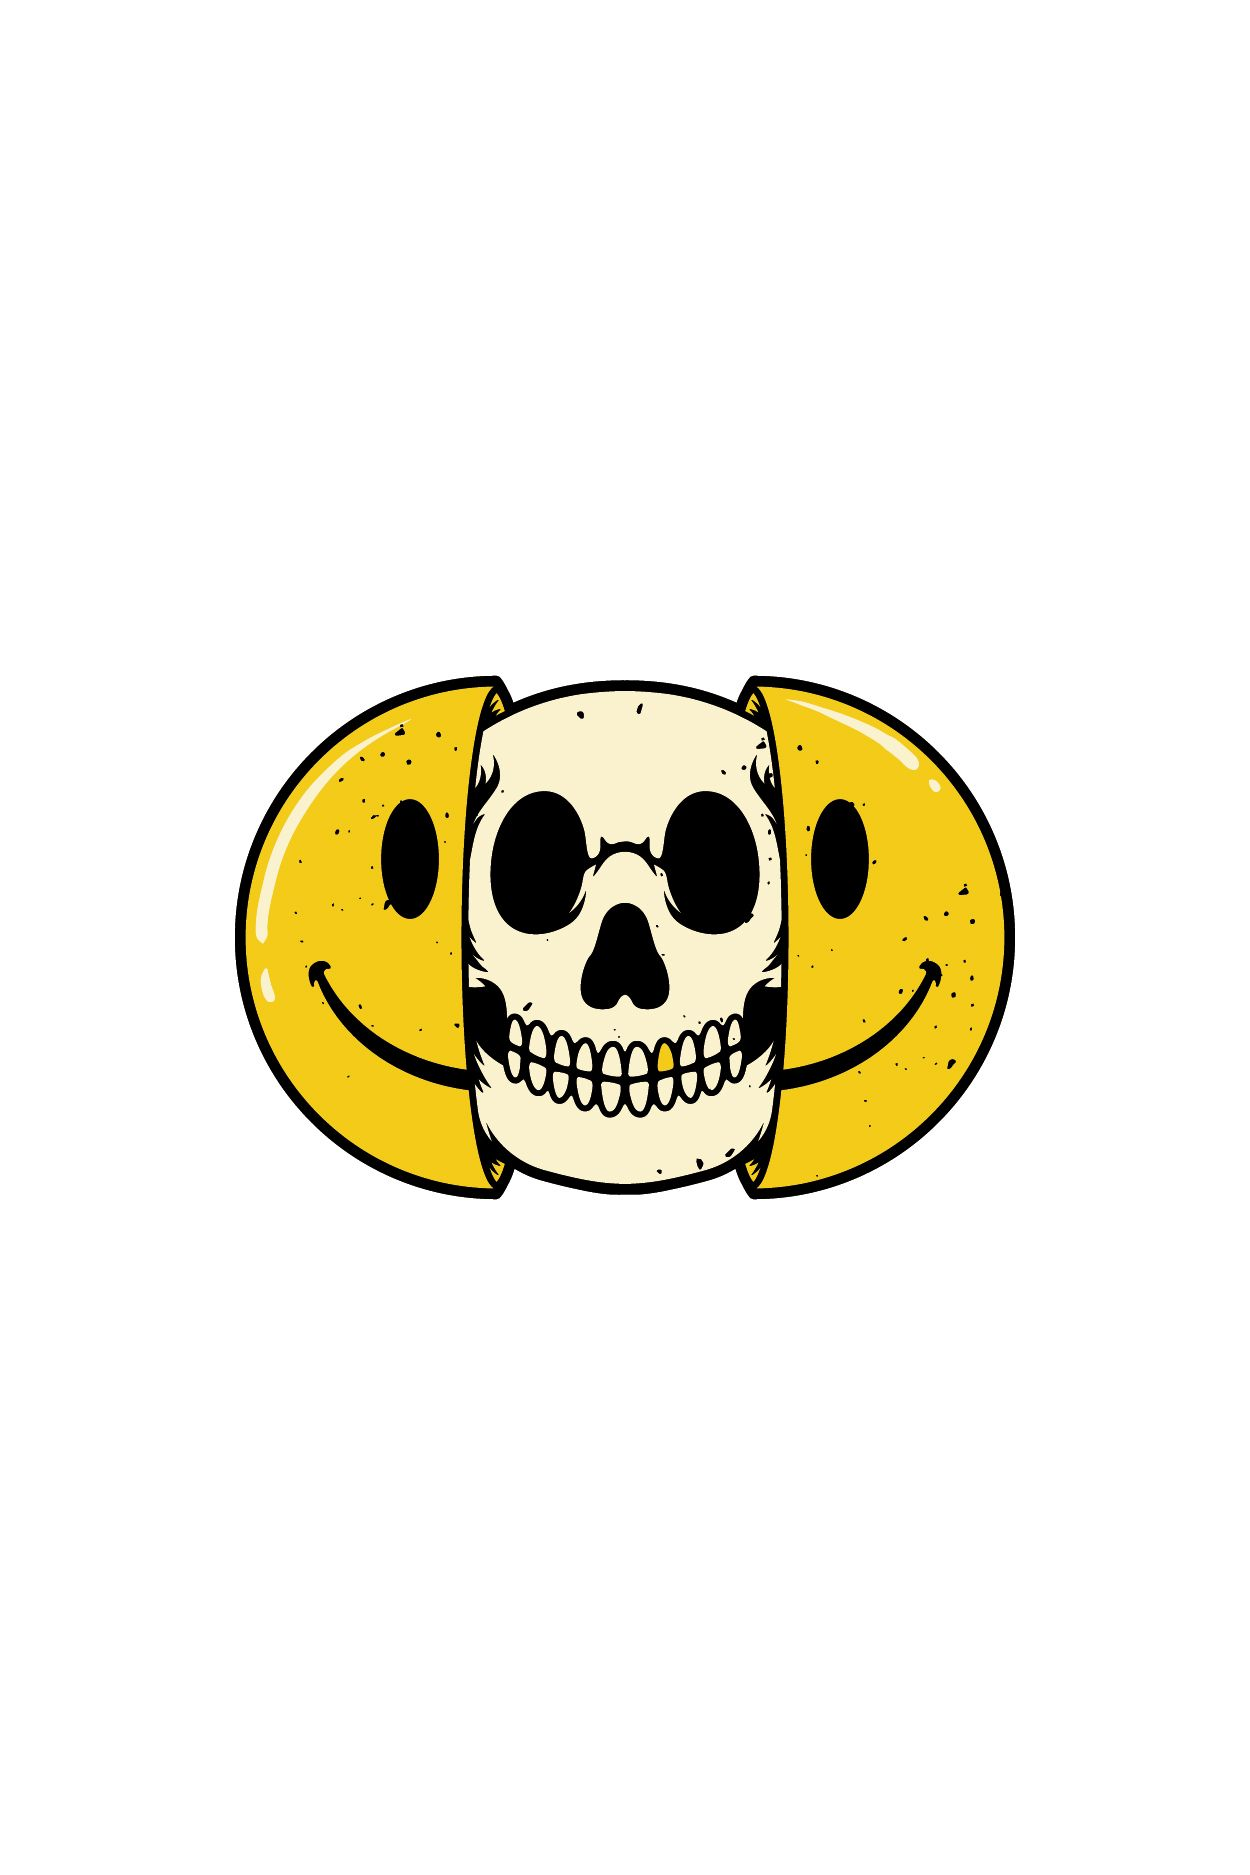 Half Skull Emoticons Emojis With Bright Backgrounds Skeleton Artwork Skull Art Skeleton Art